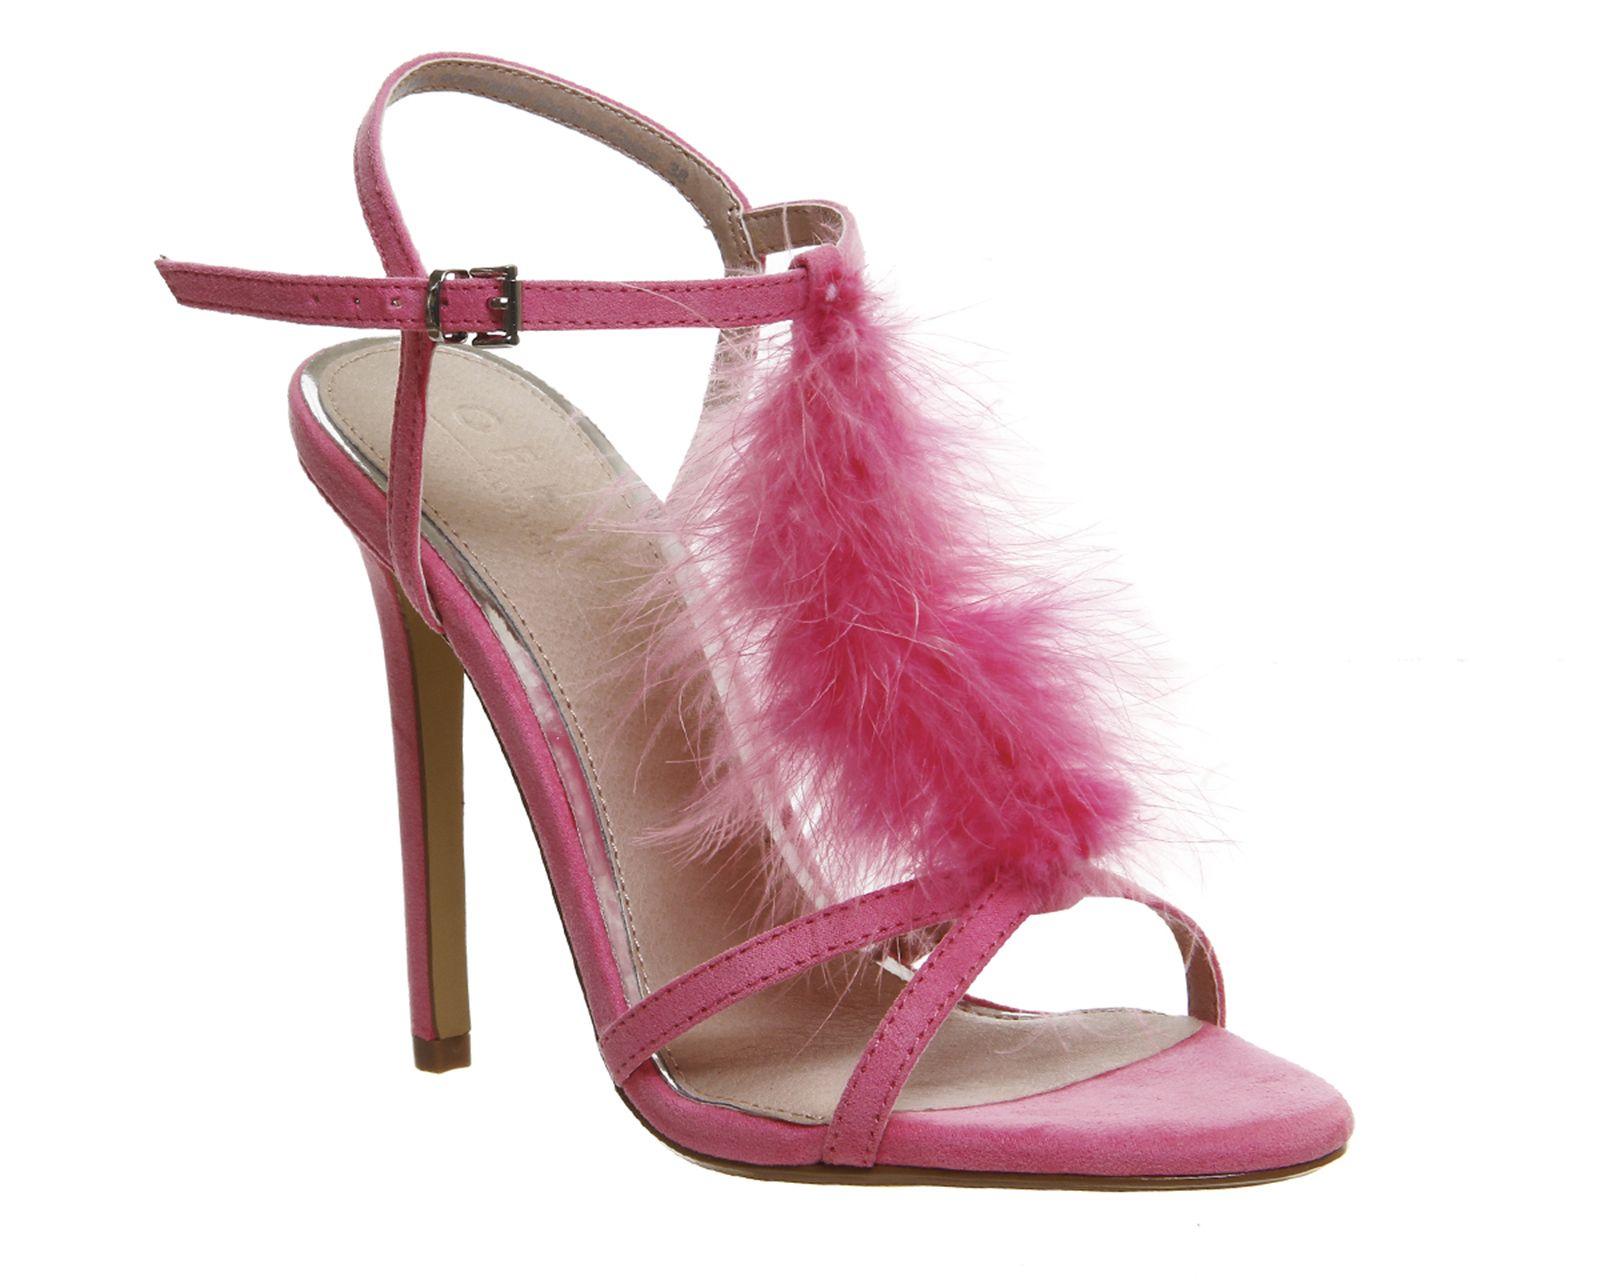 Explore Pink Office High Heelore